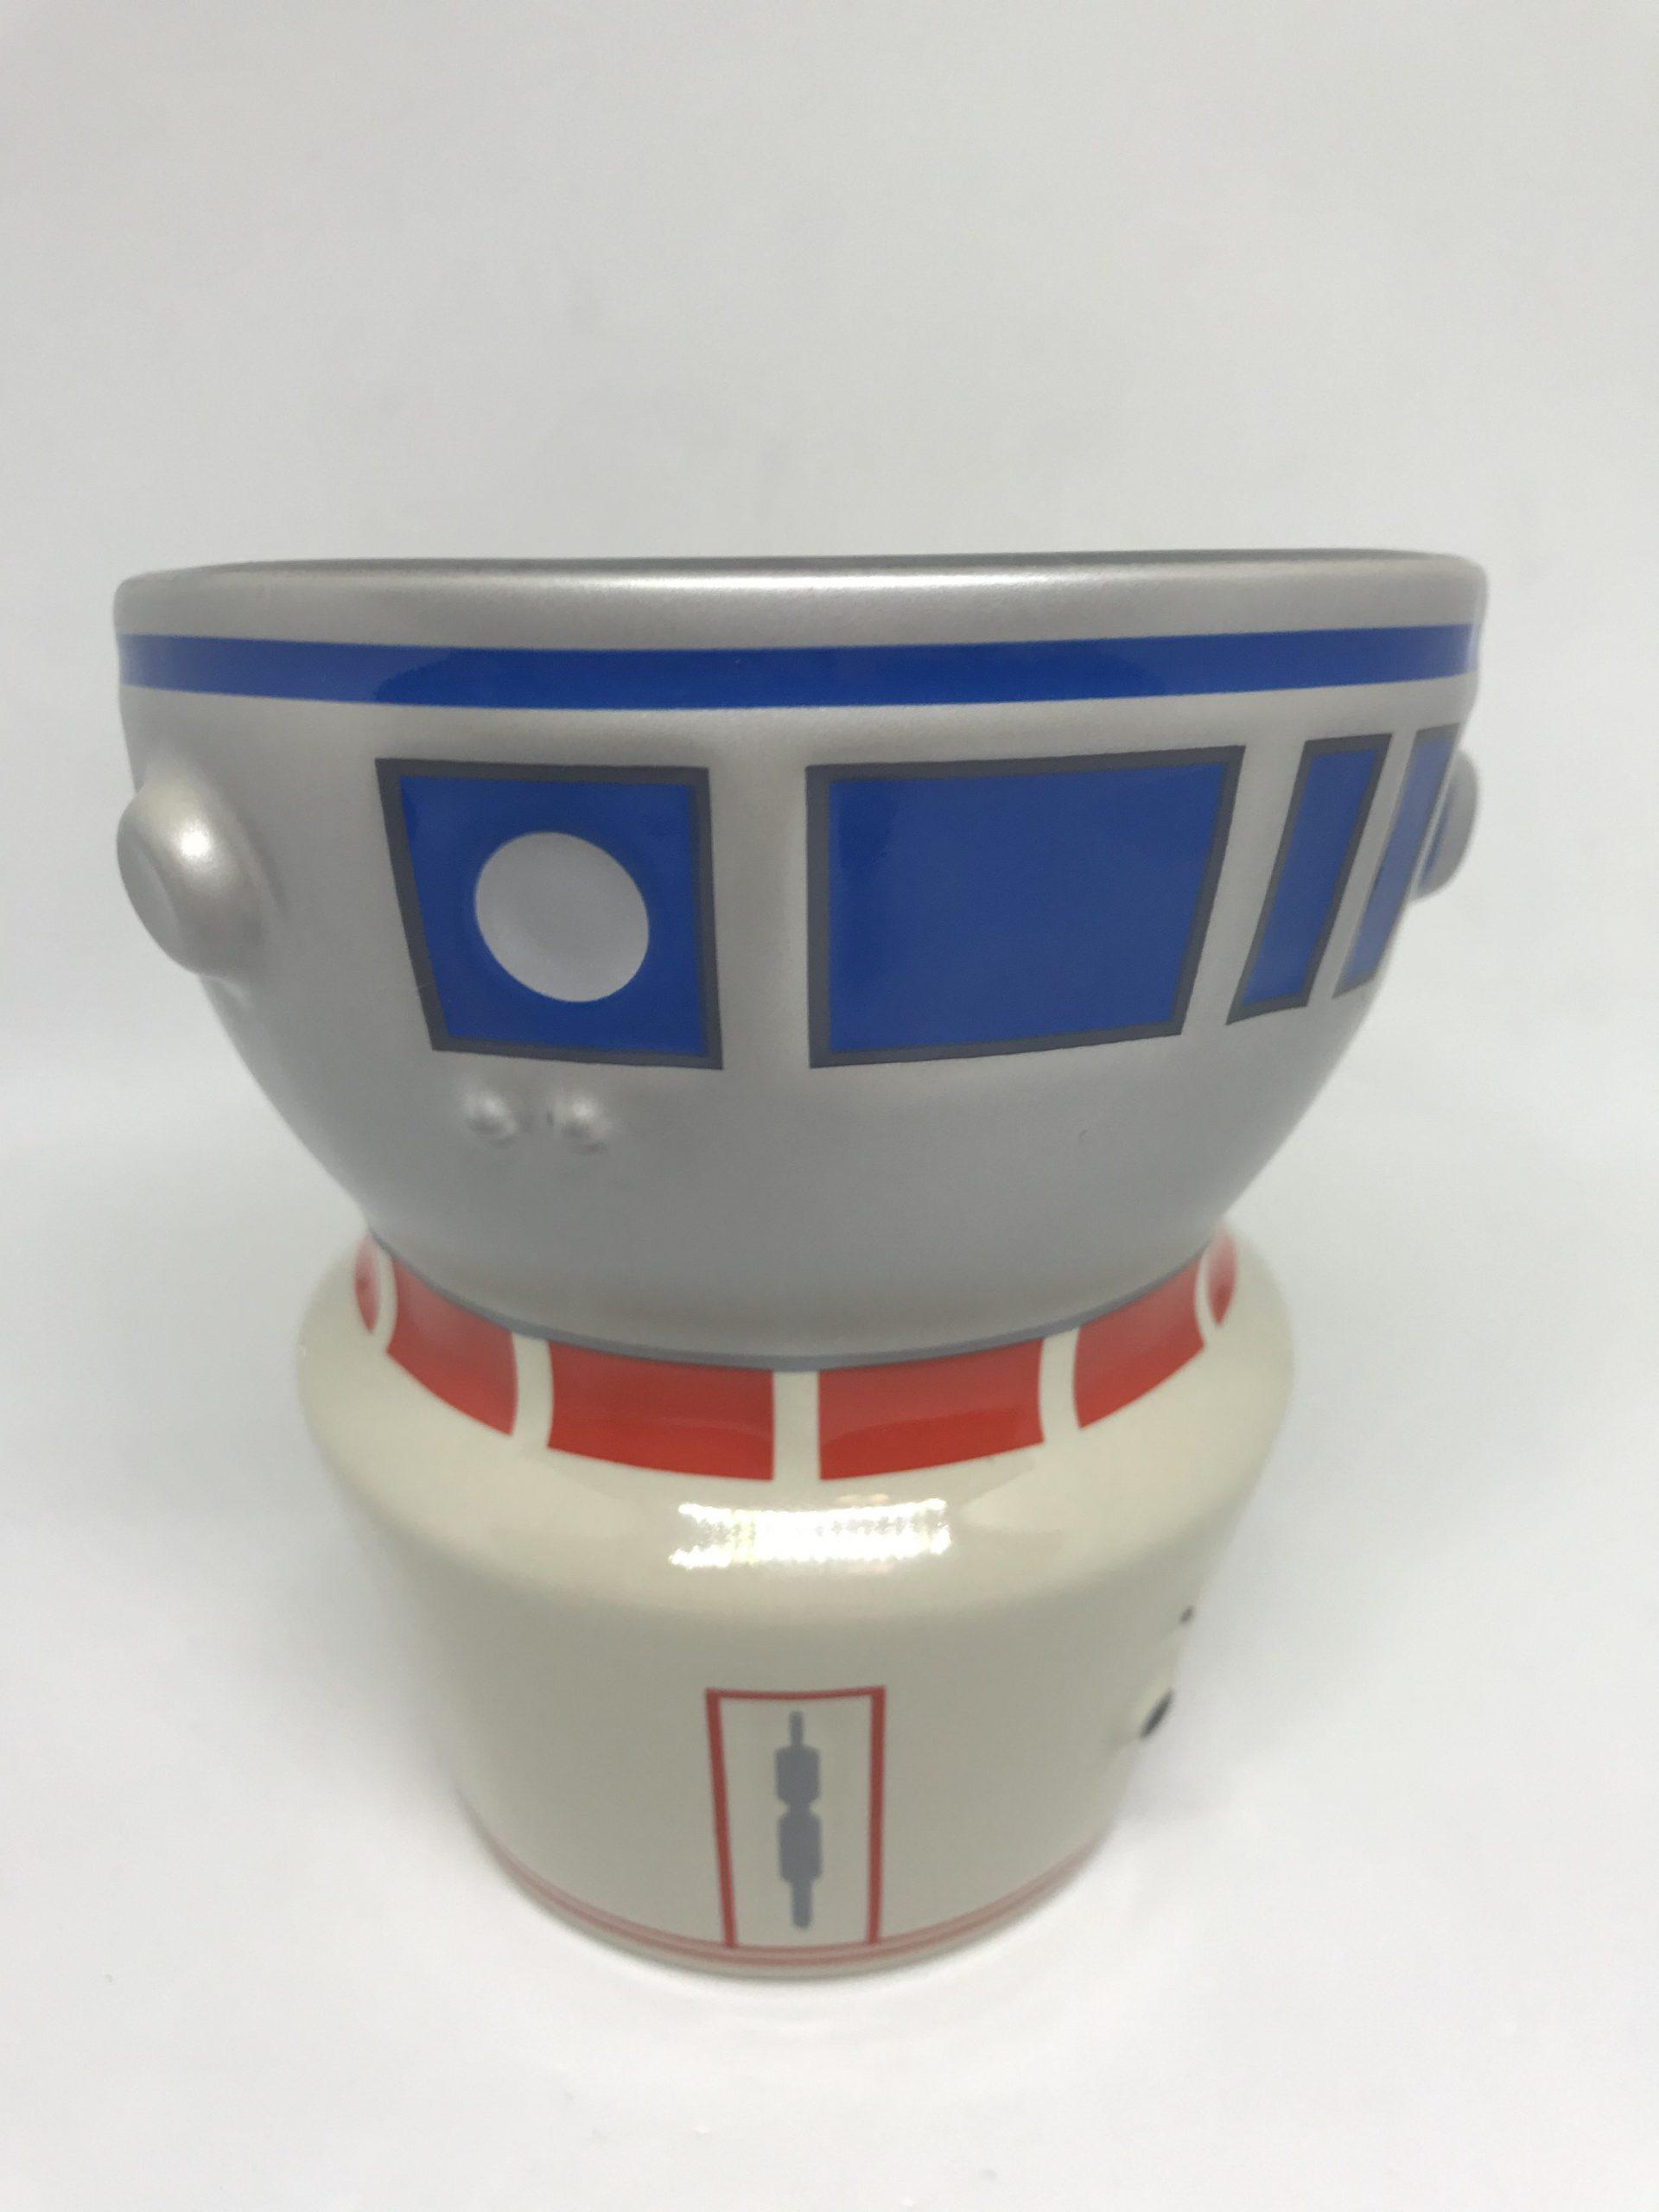 SWGE Droid Depot R2-D2 and R5-D4 Coffee Mug 1